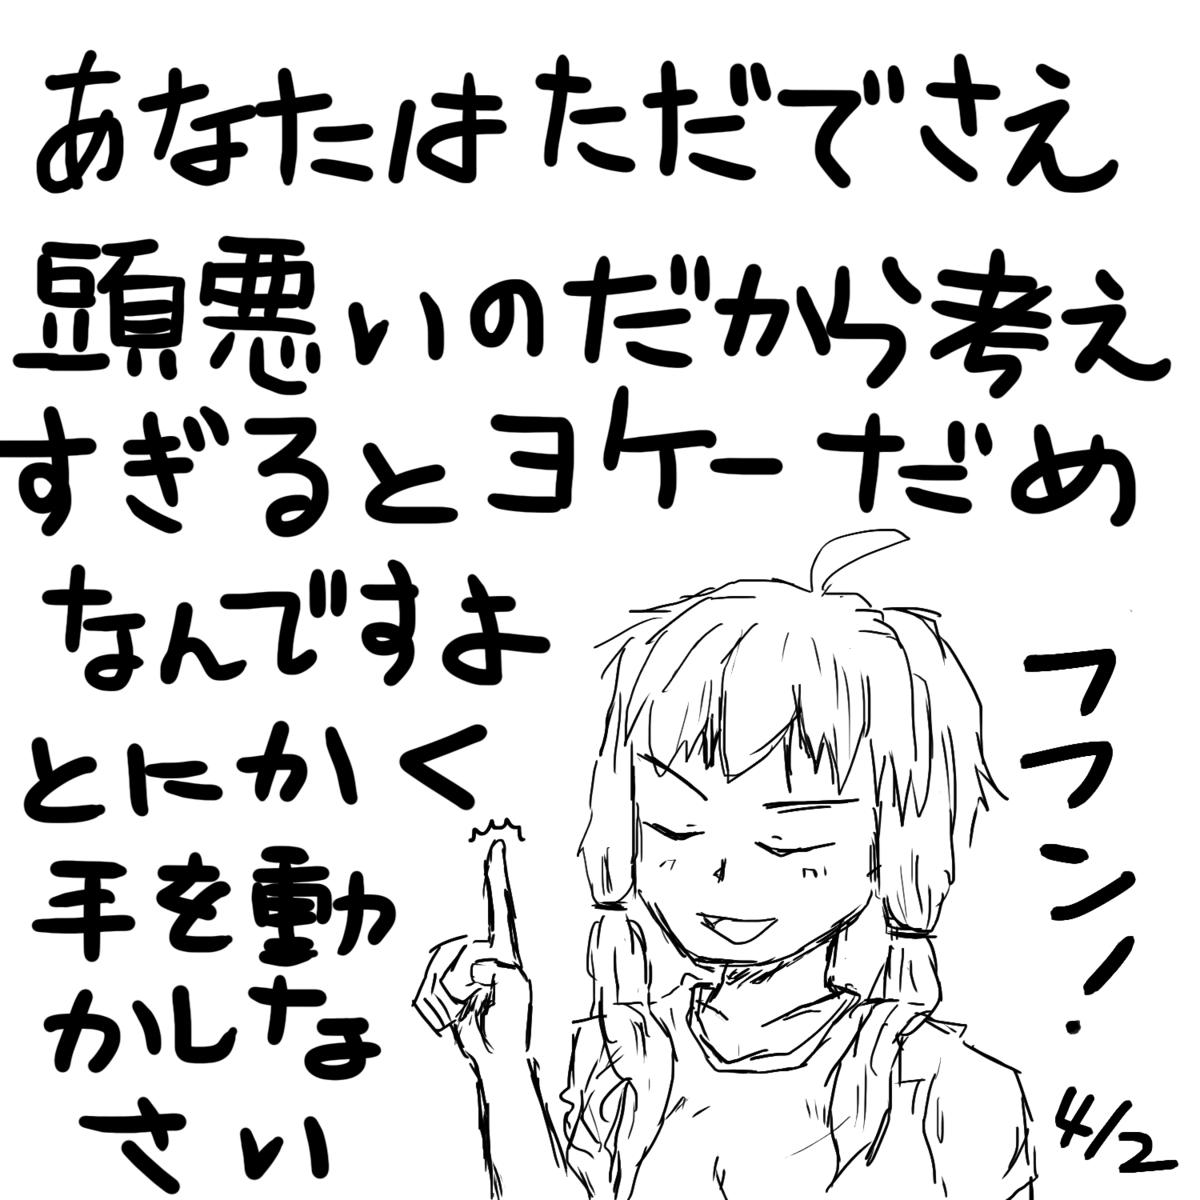 f:id:zomuzomu:20200402122947p:plain